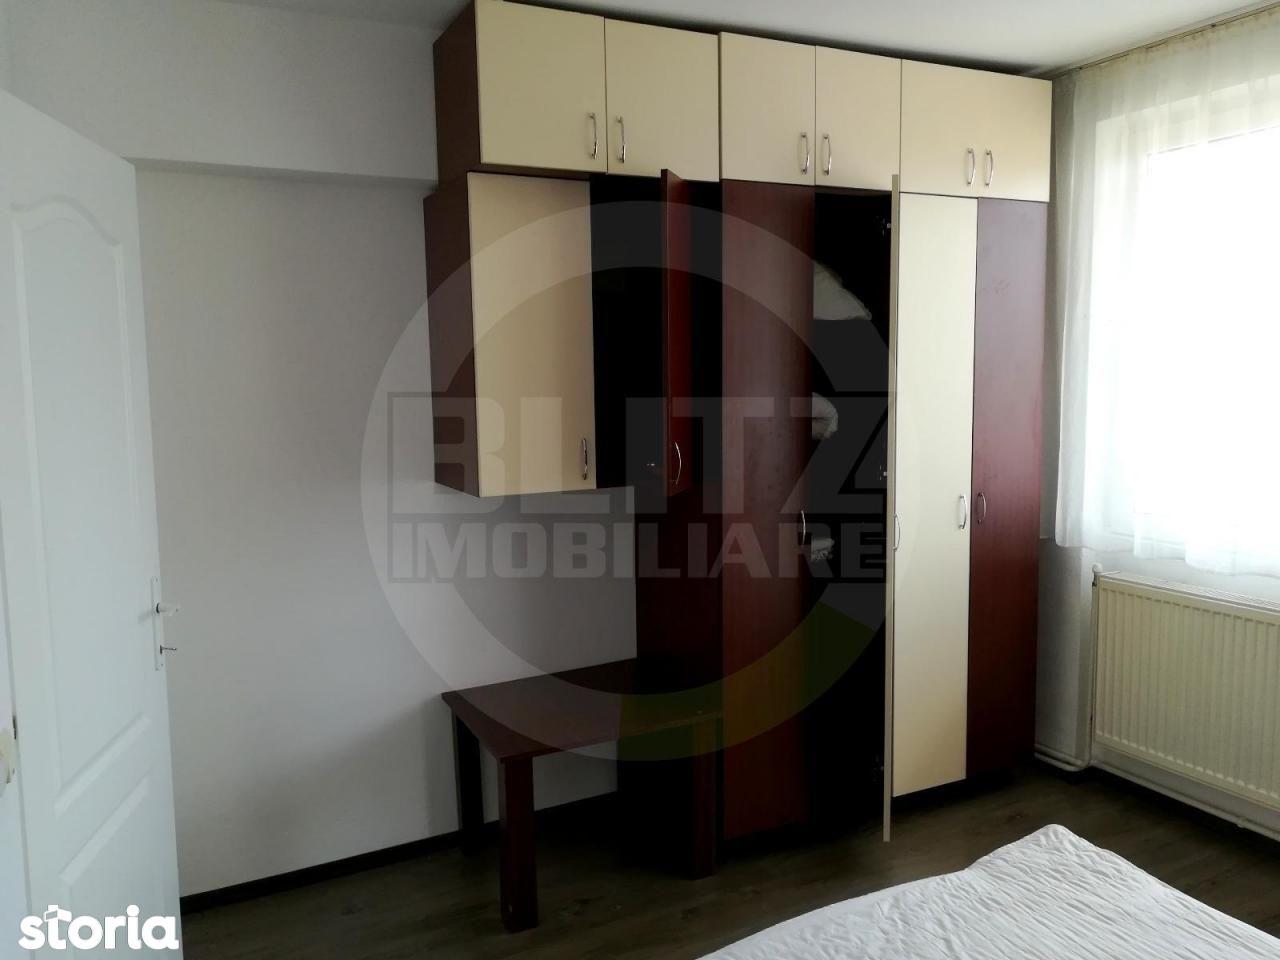 Apartament de vanzare, Cluj-Napoca, Cluj, Centru - Foto 5